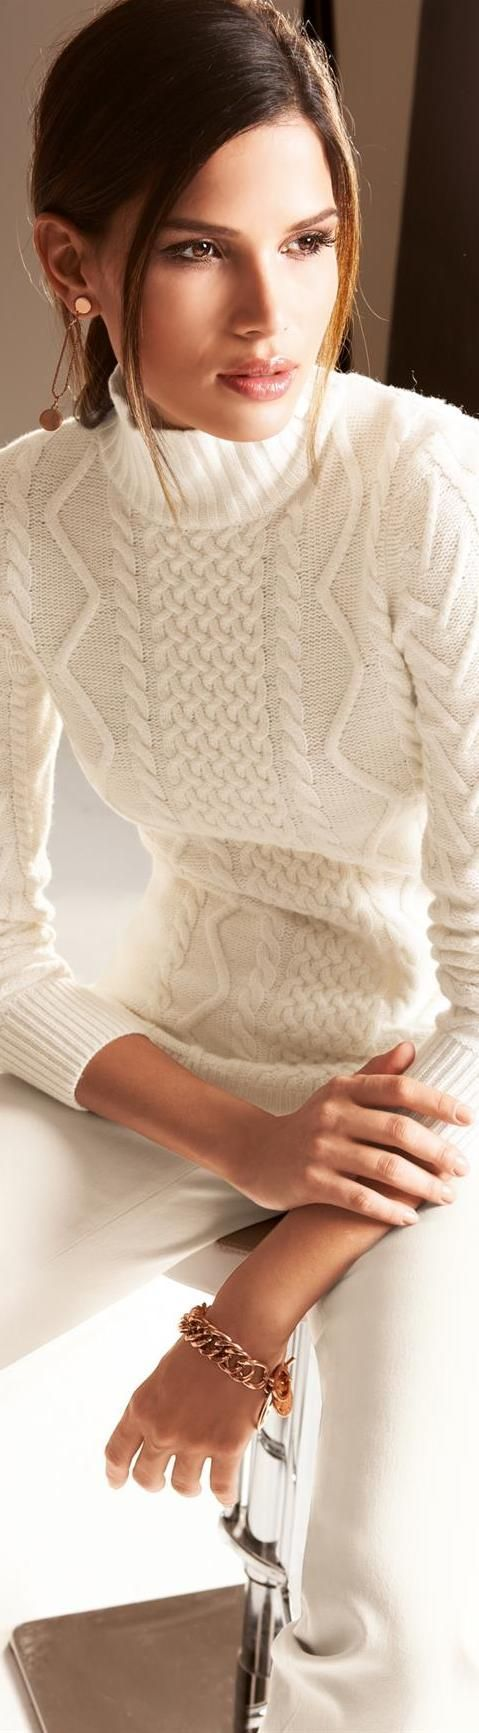 Women's fashion elegance in white. #fahion